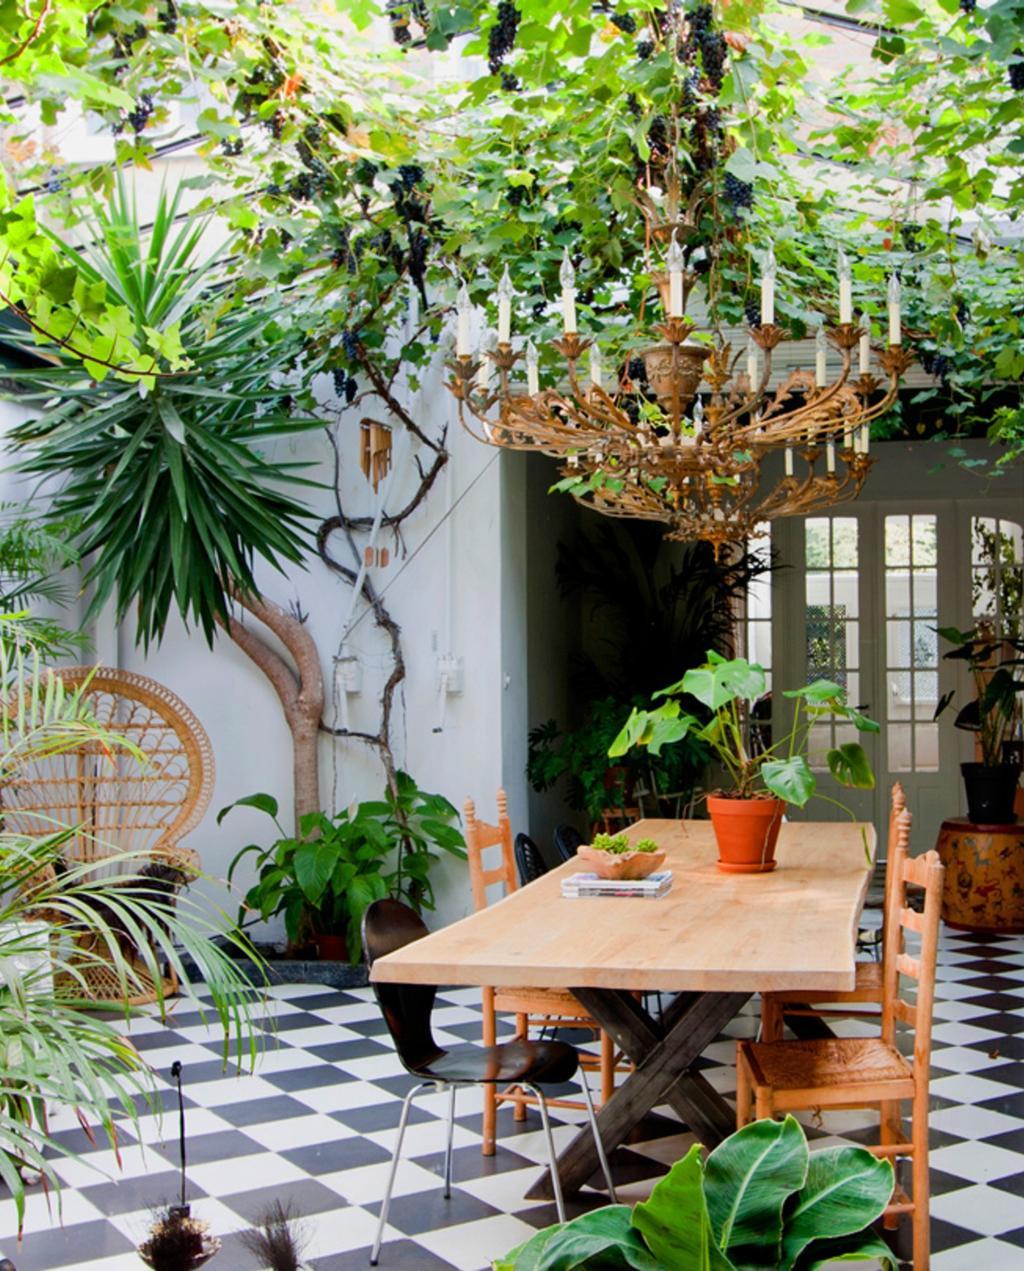 Binnenkijken | urban jungle | planten